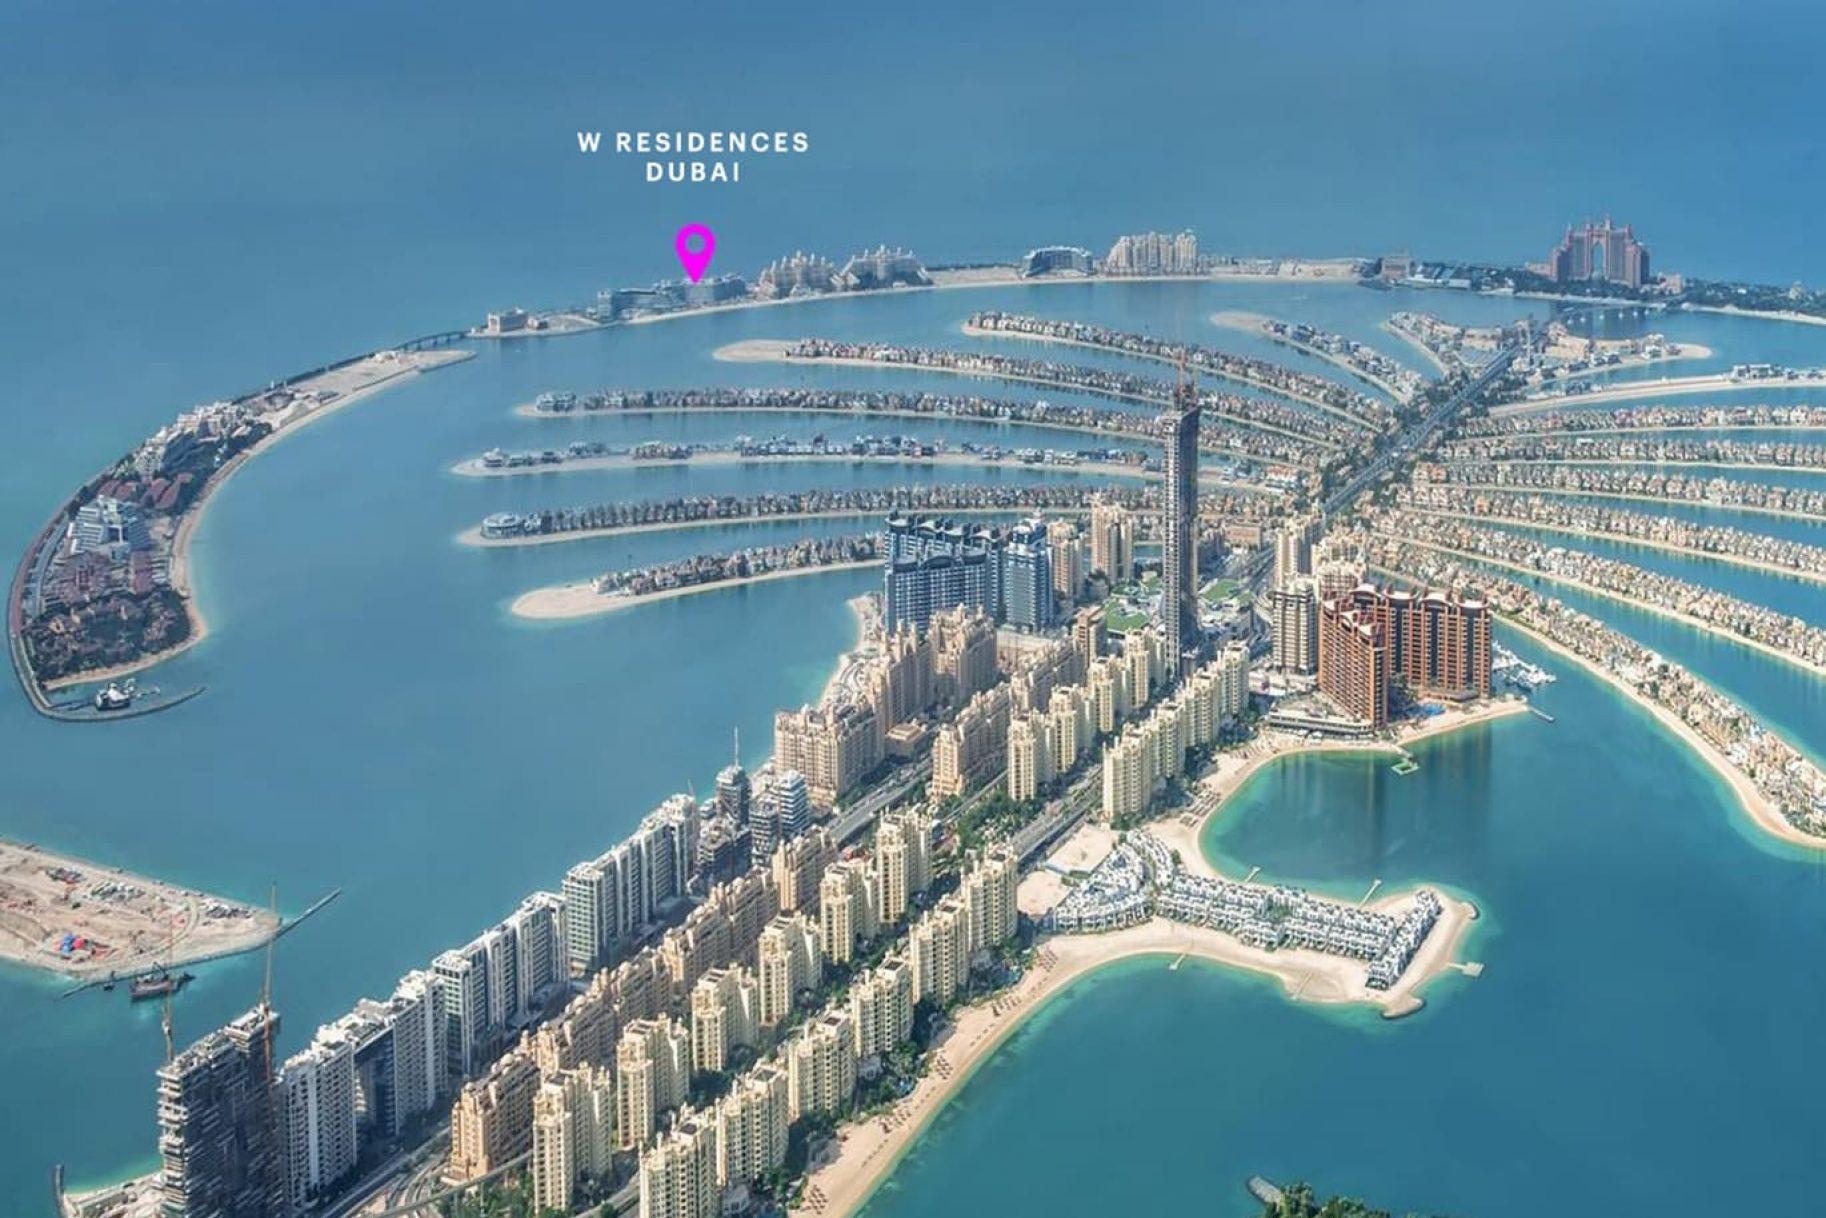 A pointer indicates the location of W Residences Dubai development of luxury apartments on Palm Jumeirah, Dubai